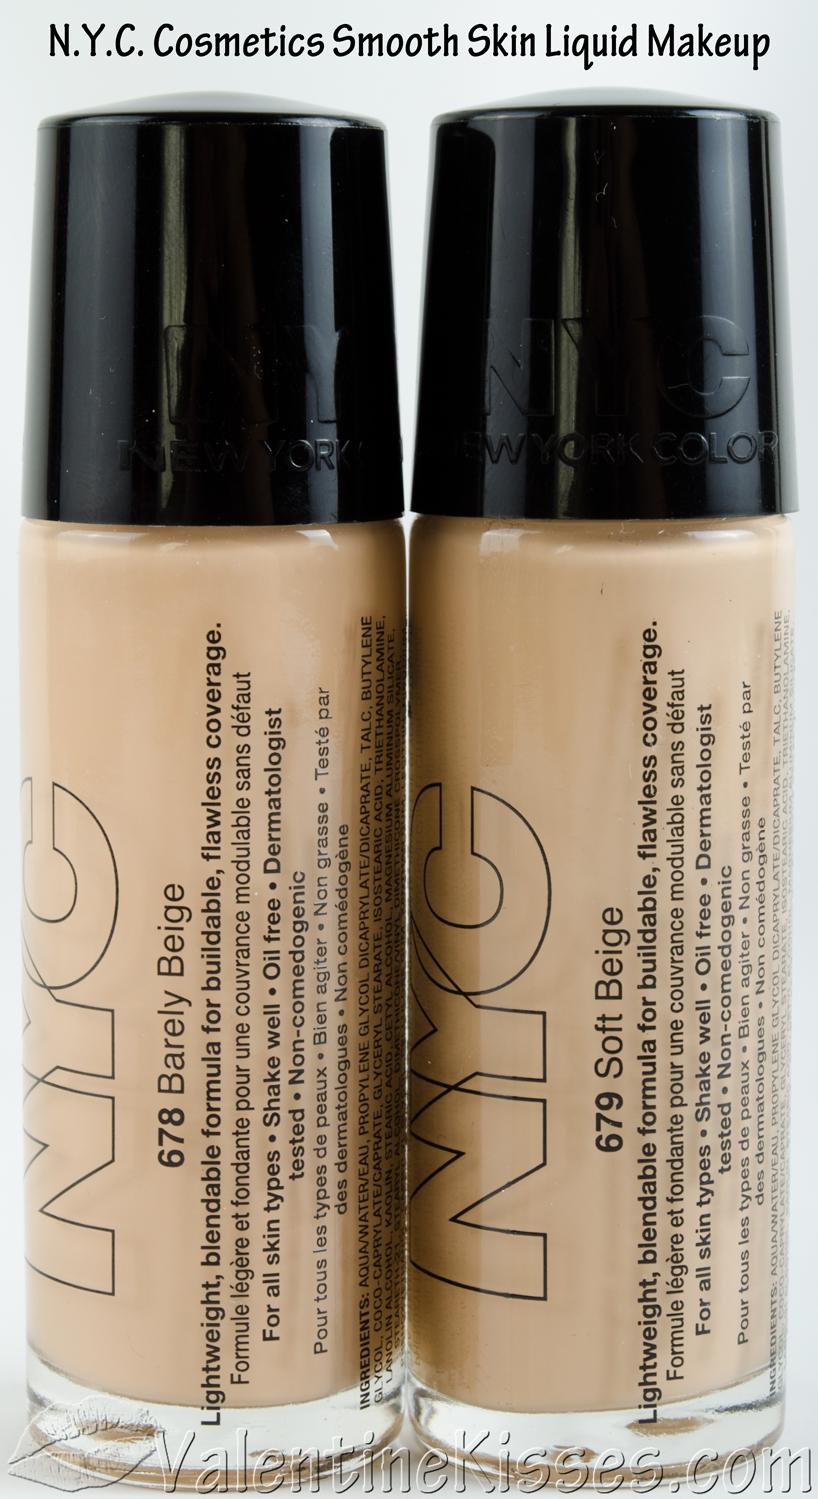 Cosmetics And Makeup: Valentine Kisses: N.Y.C. Cosmetics Smooth Skin Liquid